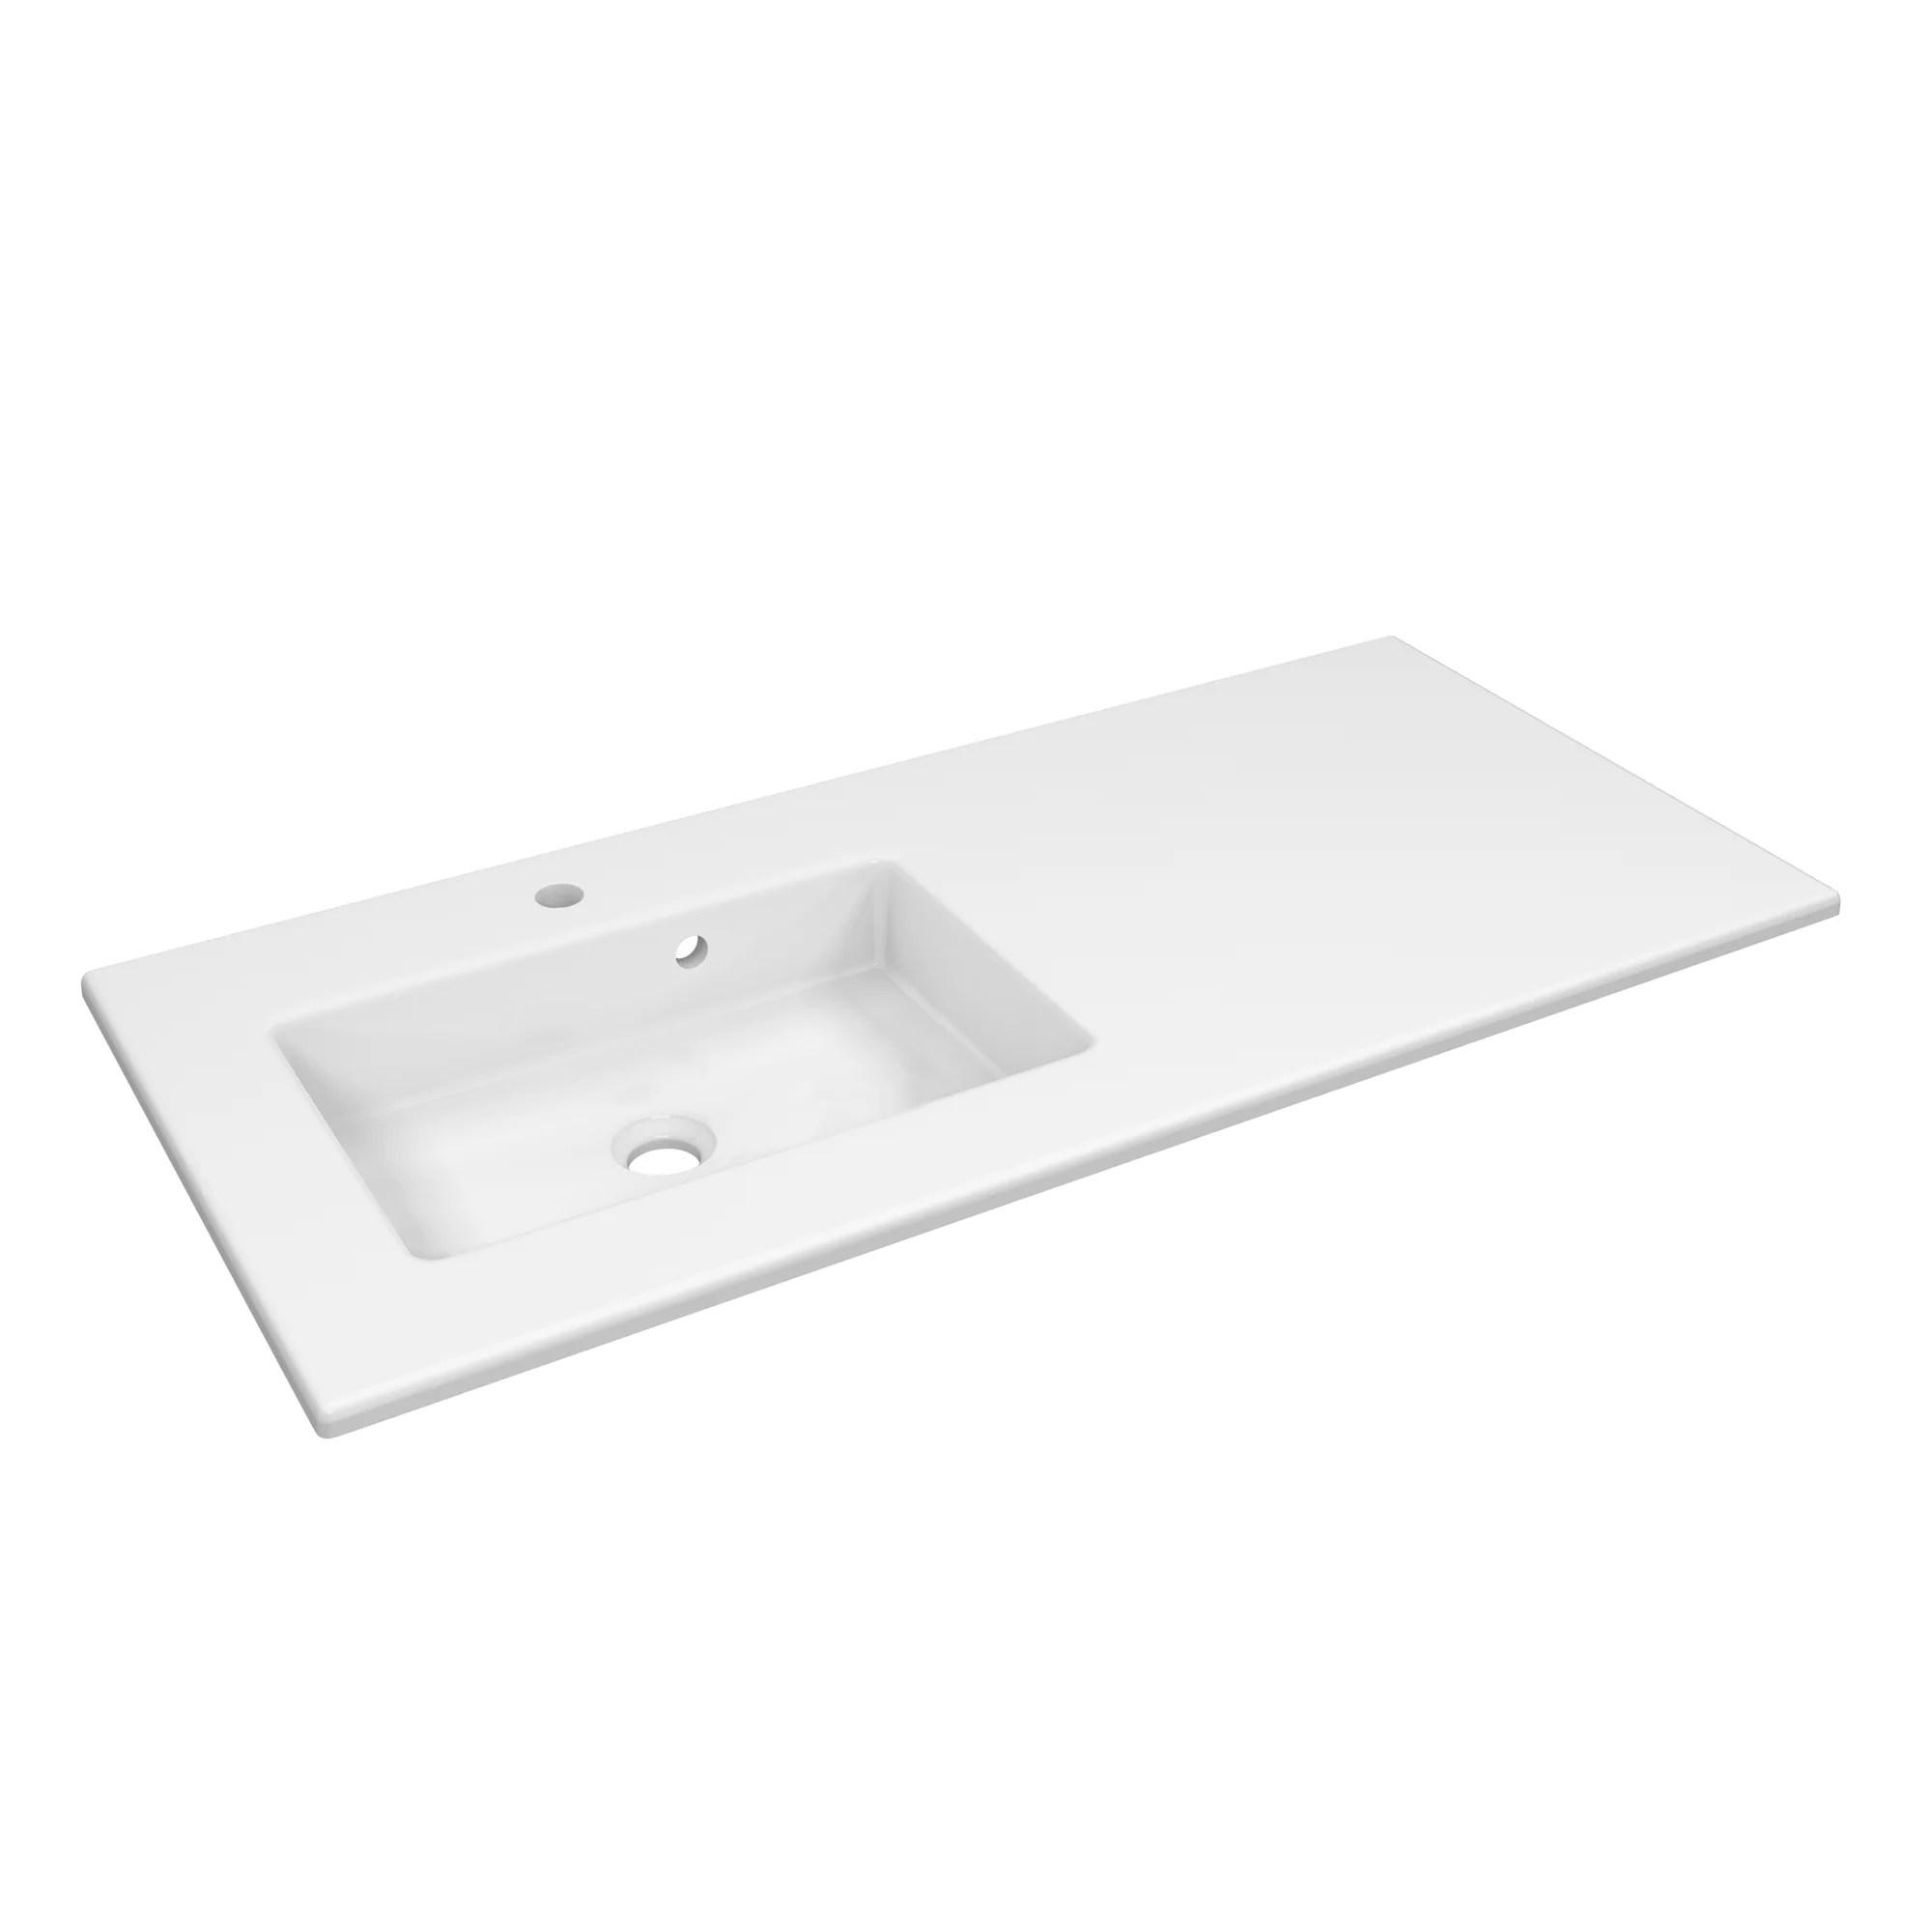 vasque a encastrer ceramique serie max l 71 blanc